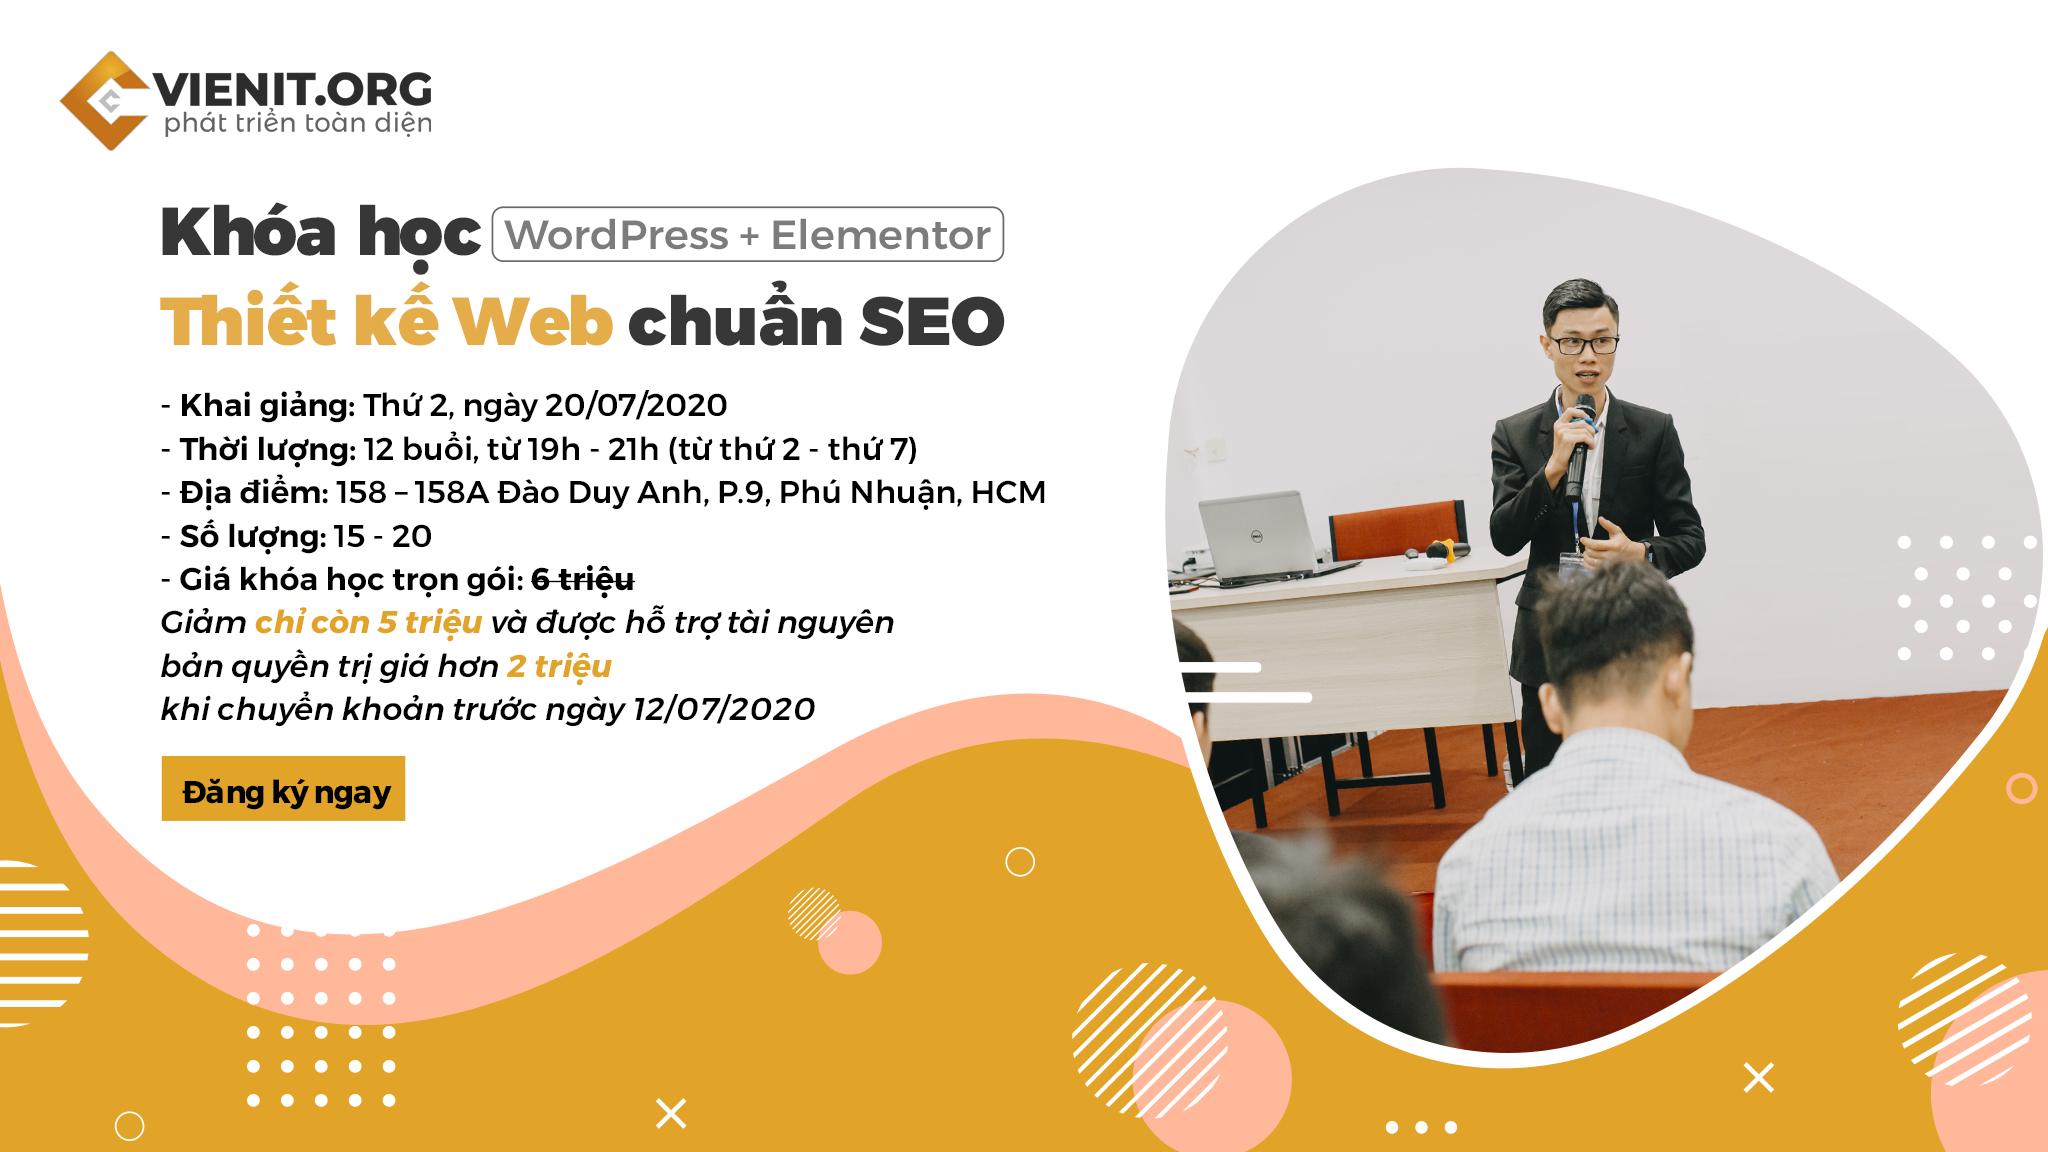 Khóa học thiết kế website chuẩn SEO Viện IT 20/07/2020